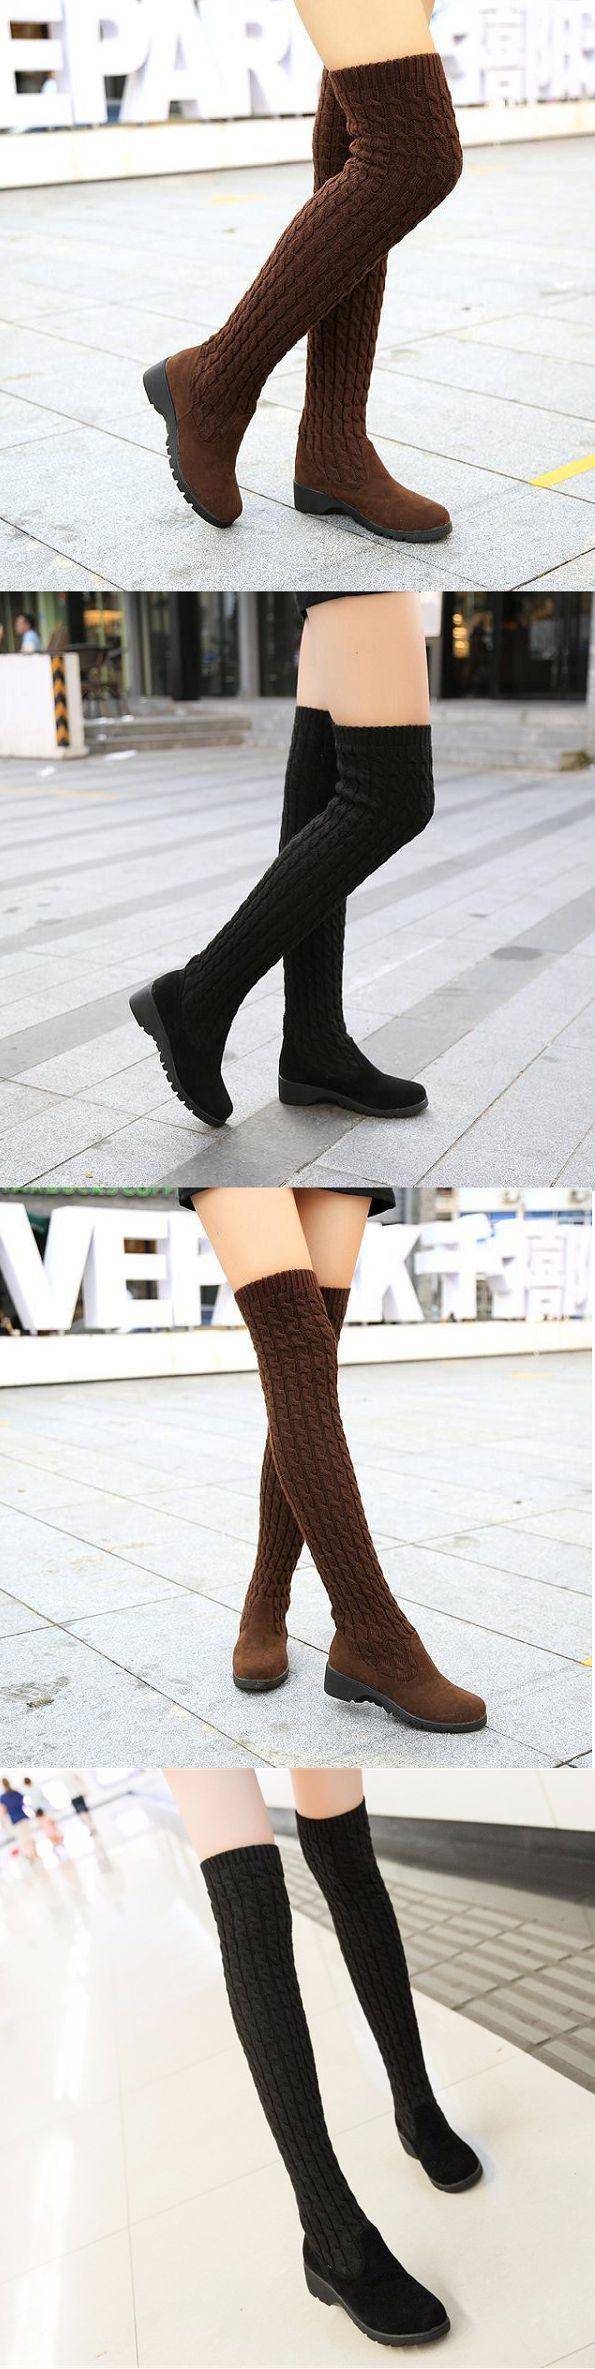 US$19.54 Knitting Wool Over The Knee Chic Slip On Muiti-Way Platform Boots